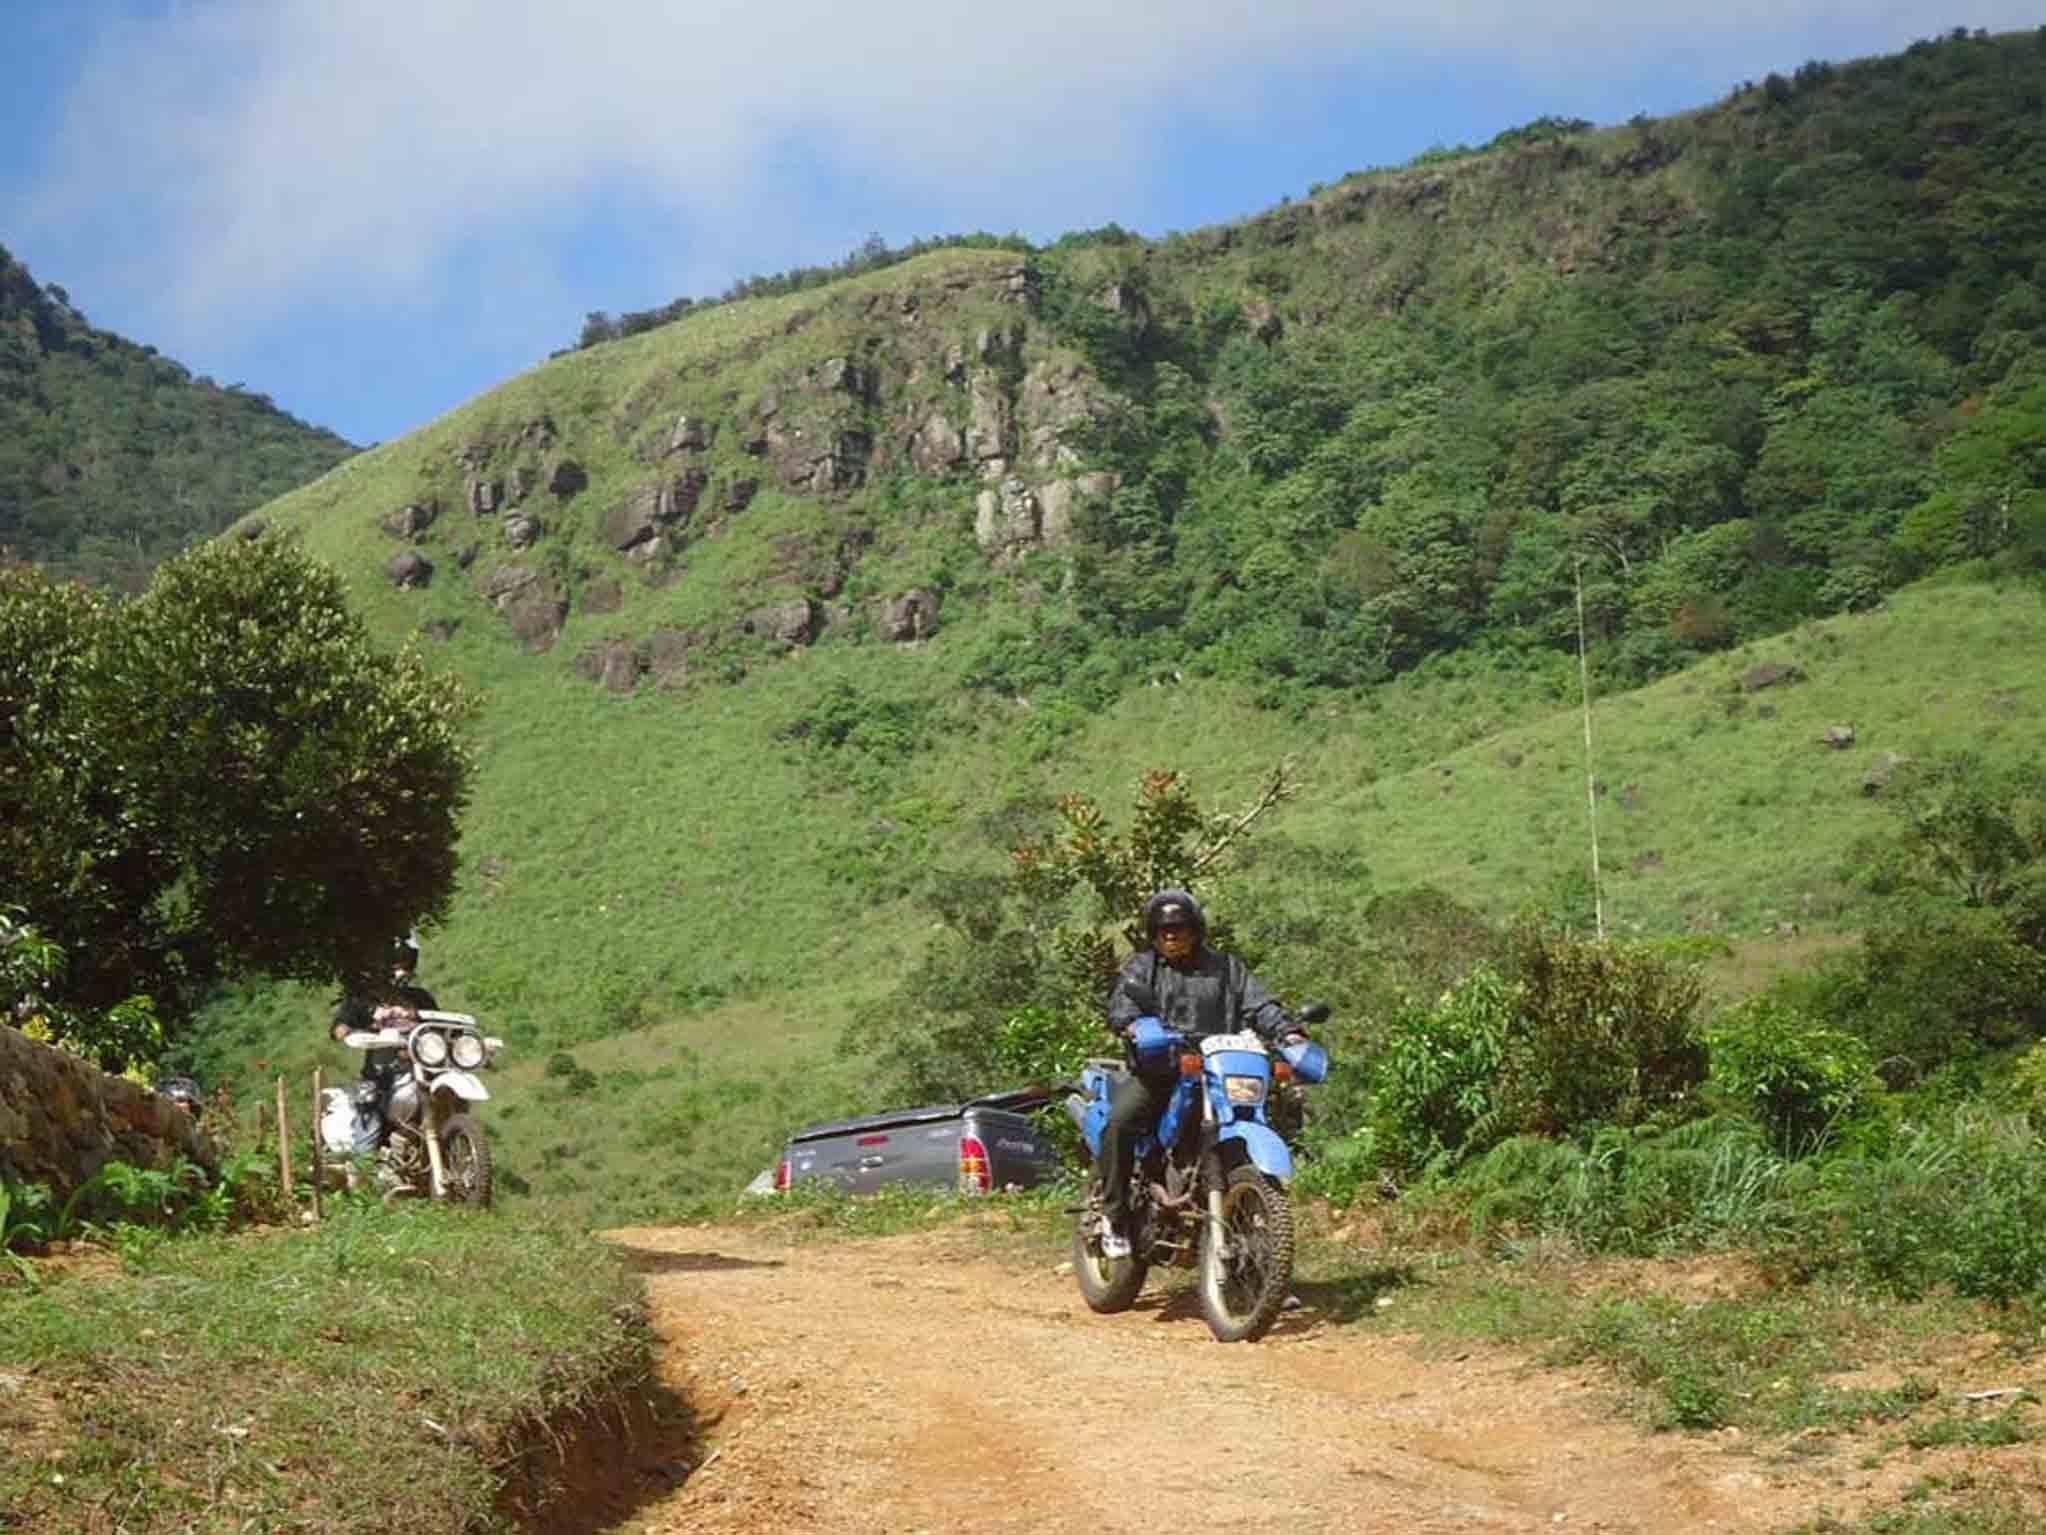 Ikman Lk Motor Bikesikman Dio Bike Matara Bicycling And The Best 50 Wiring Diagram For Rent In Sri Lanka Colombo Motorcycle